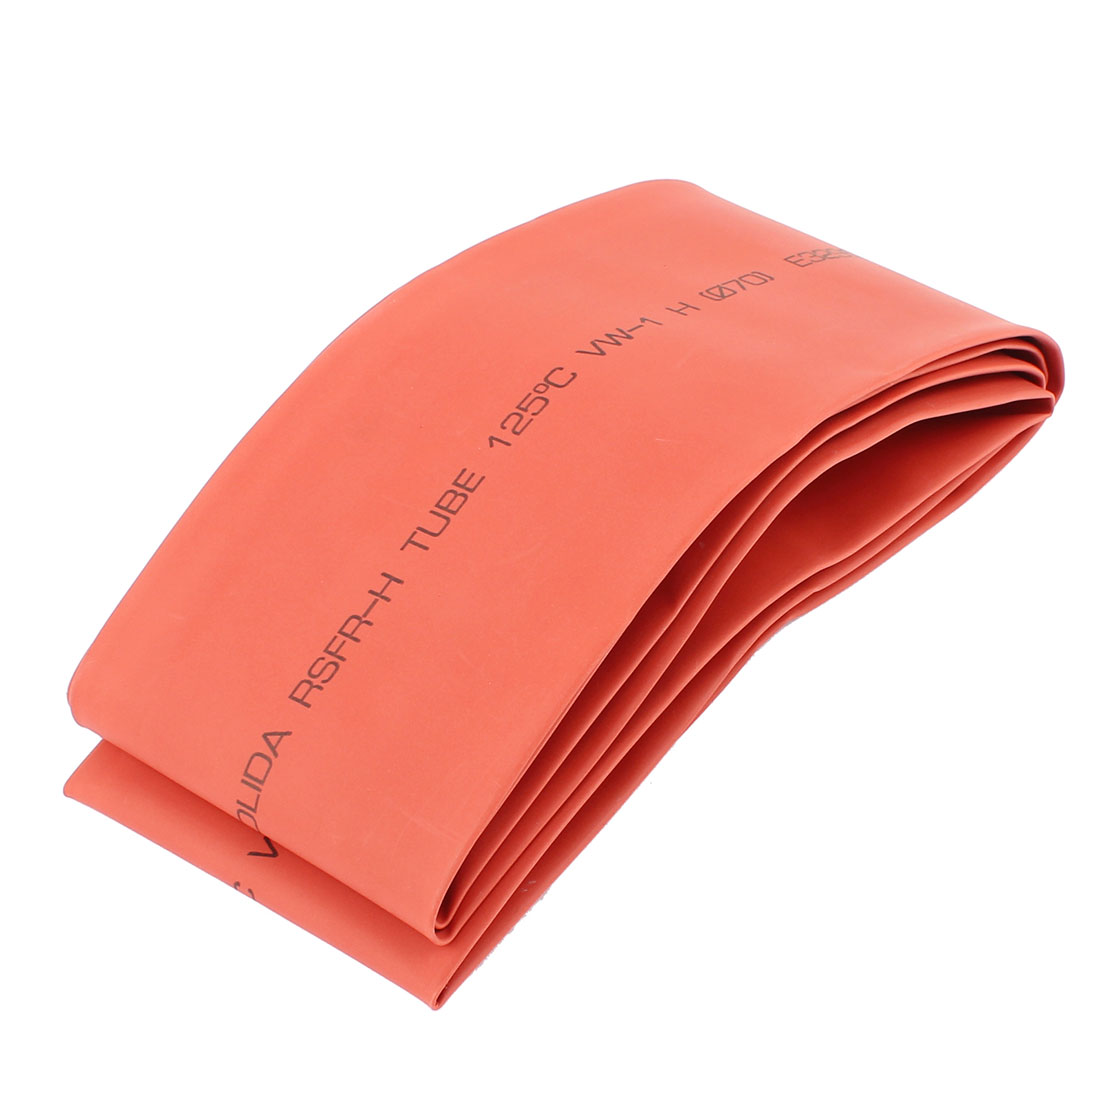 70mm Dia Ratio 2:1 Heat Shrinkable Shrinking Tube Wrap Tubing 2M Red